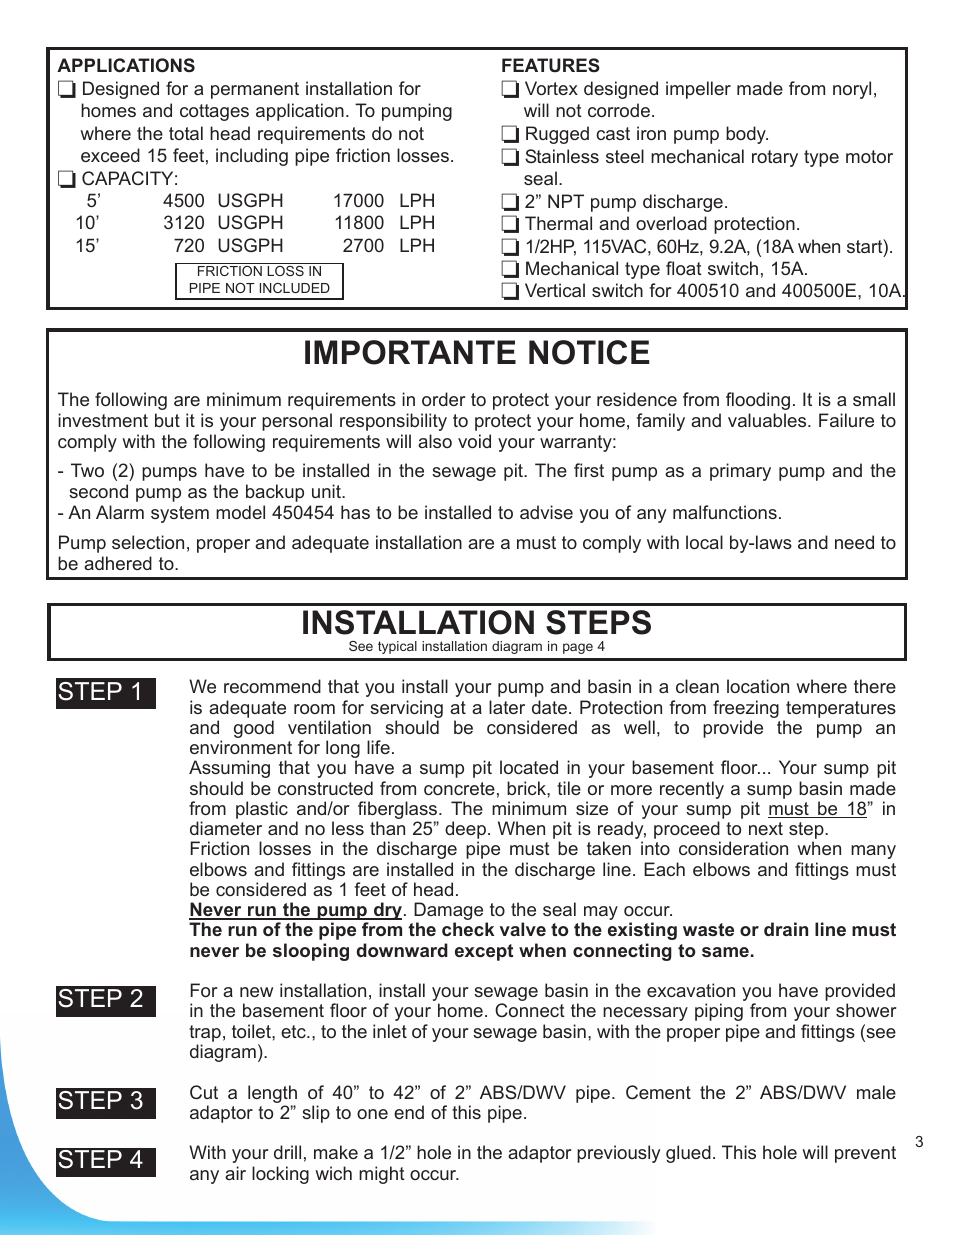 Installation steps, Importante notice, Step 1 | Burcam